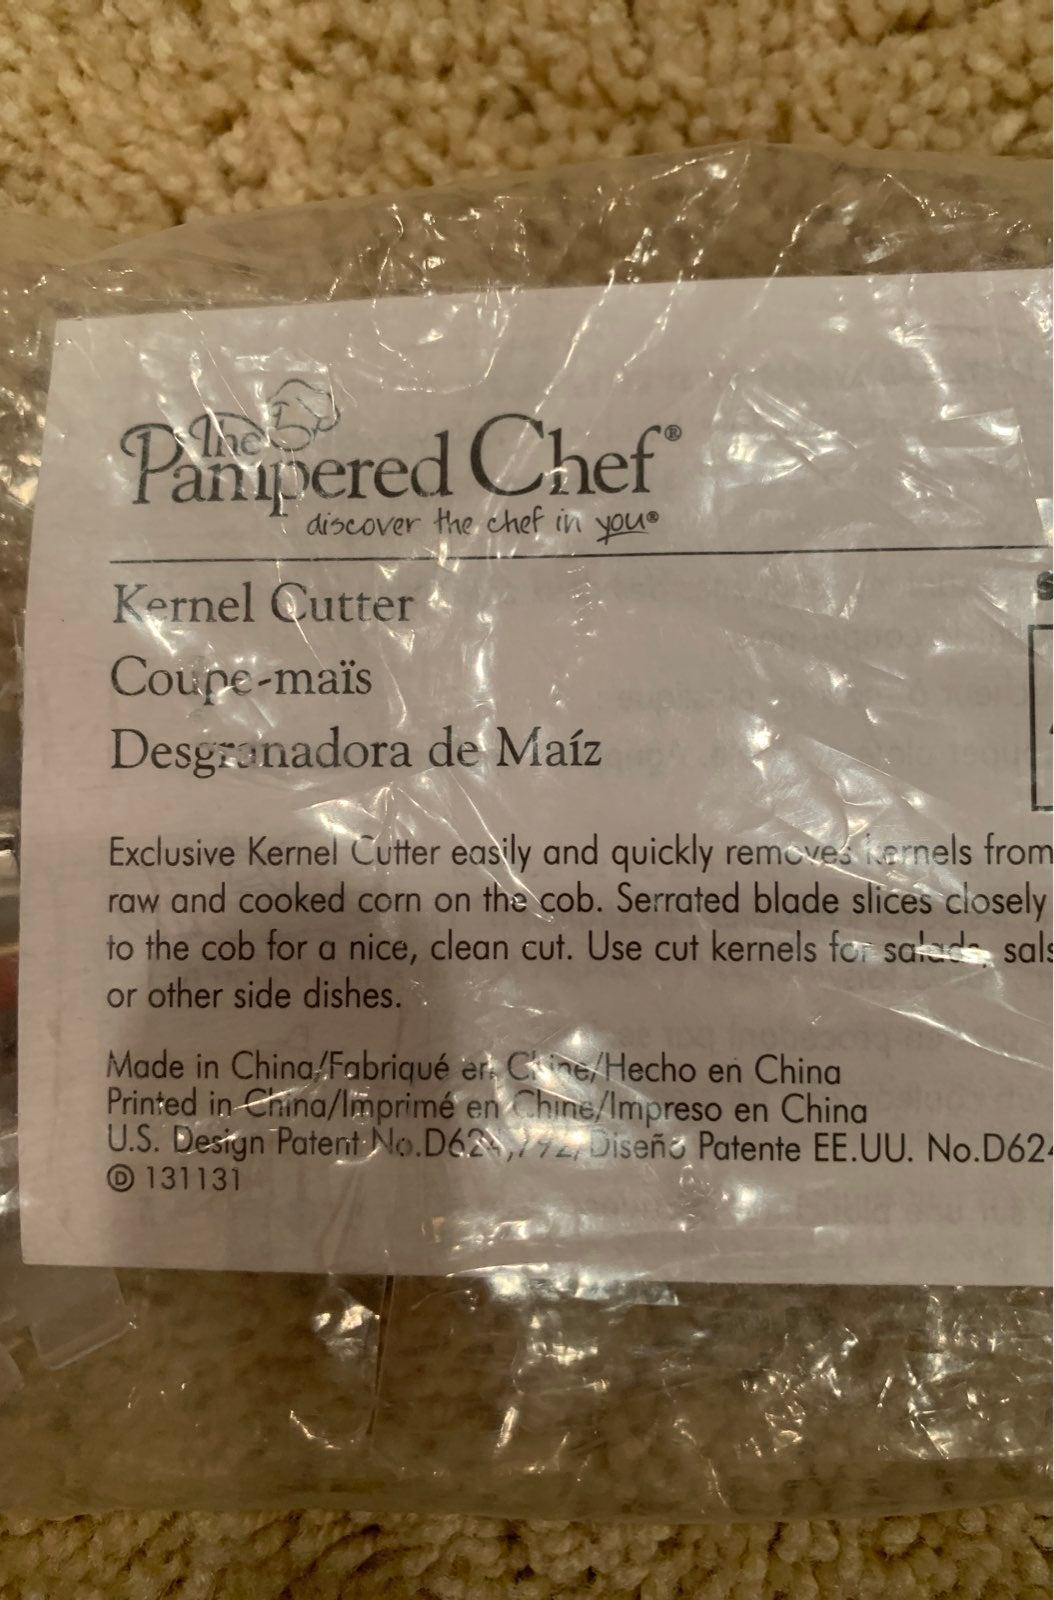 Pampered Chef Kernel Cutter